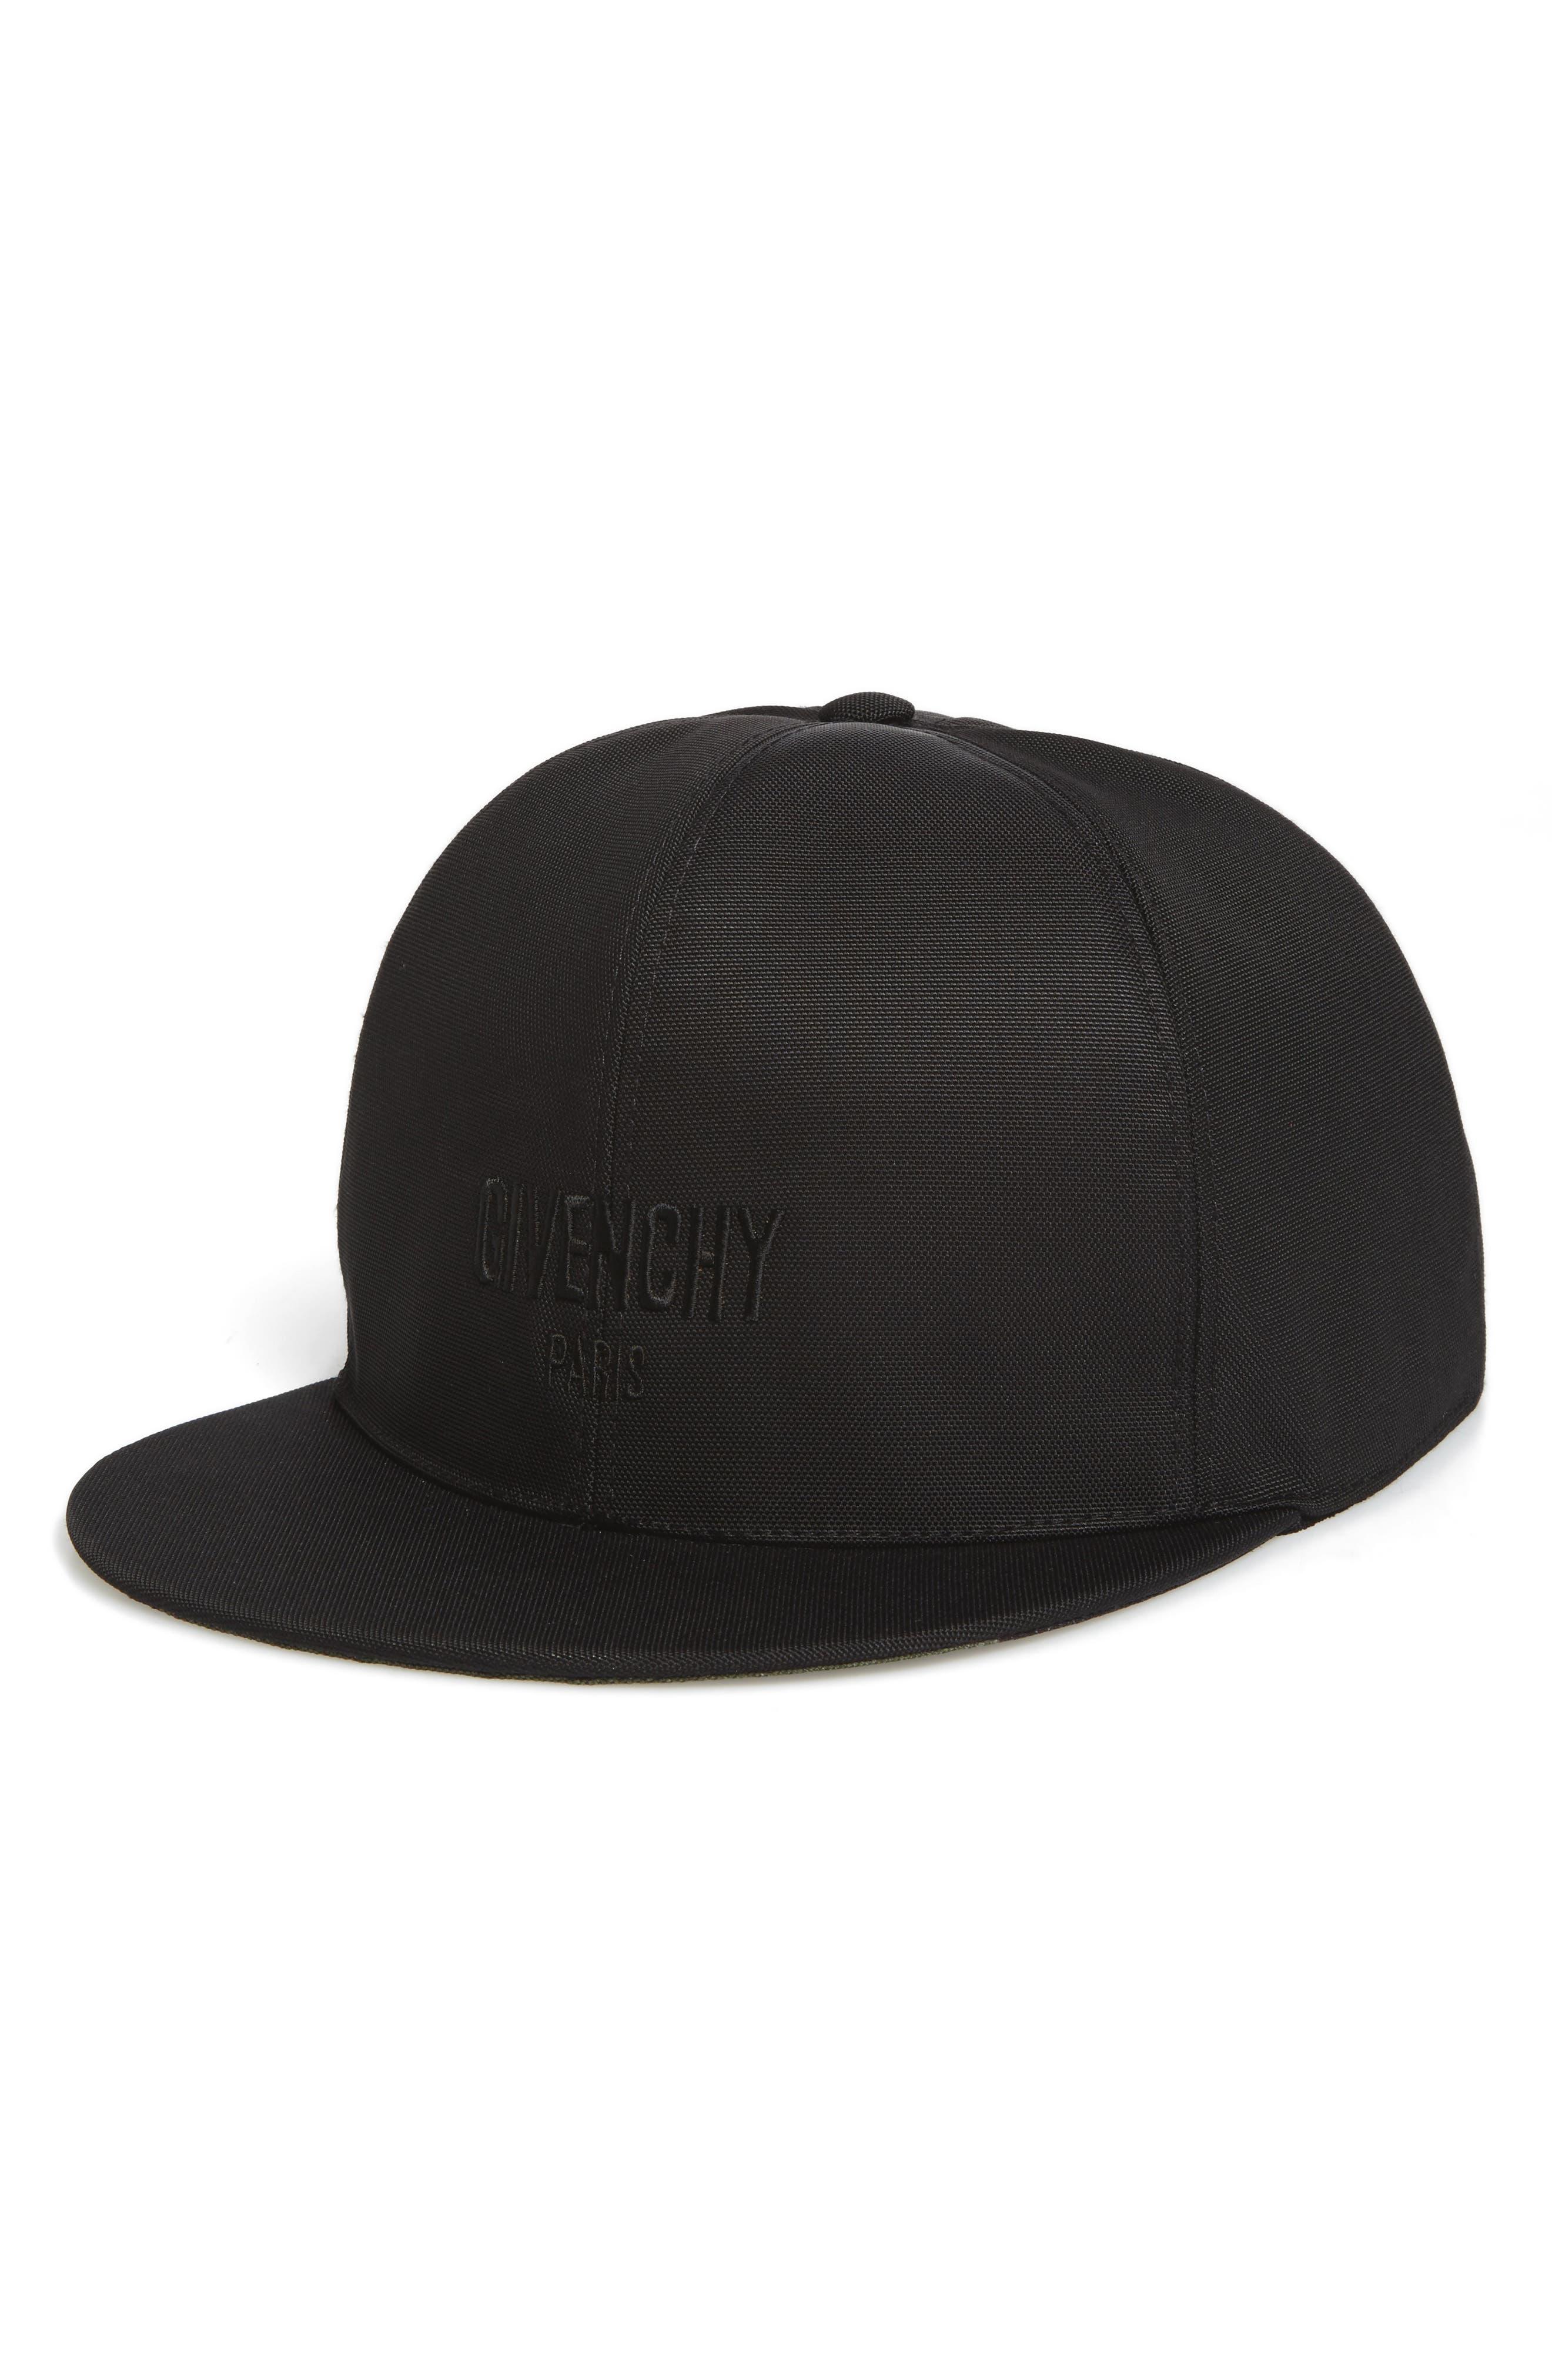 Embroidered Baseball Cap,                         Main,                         color, Black Multi